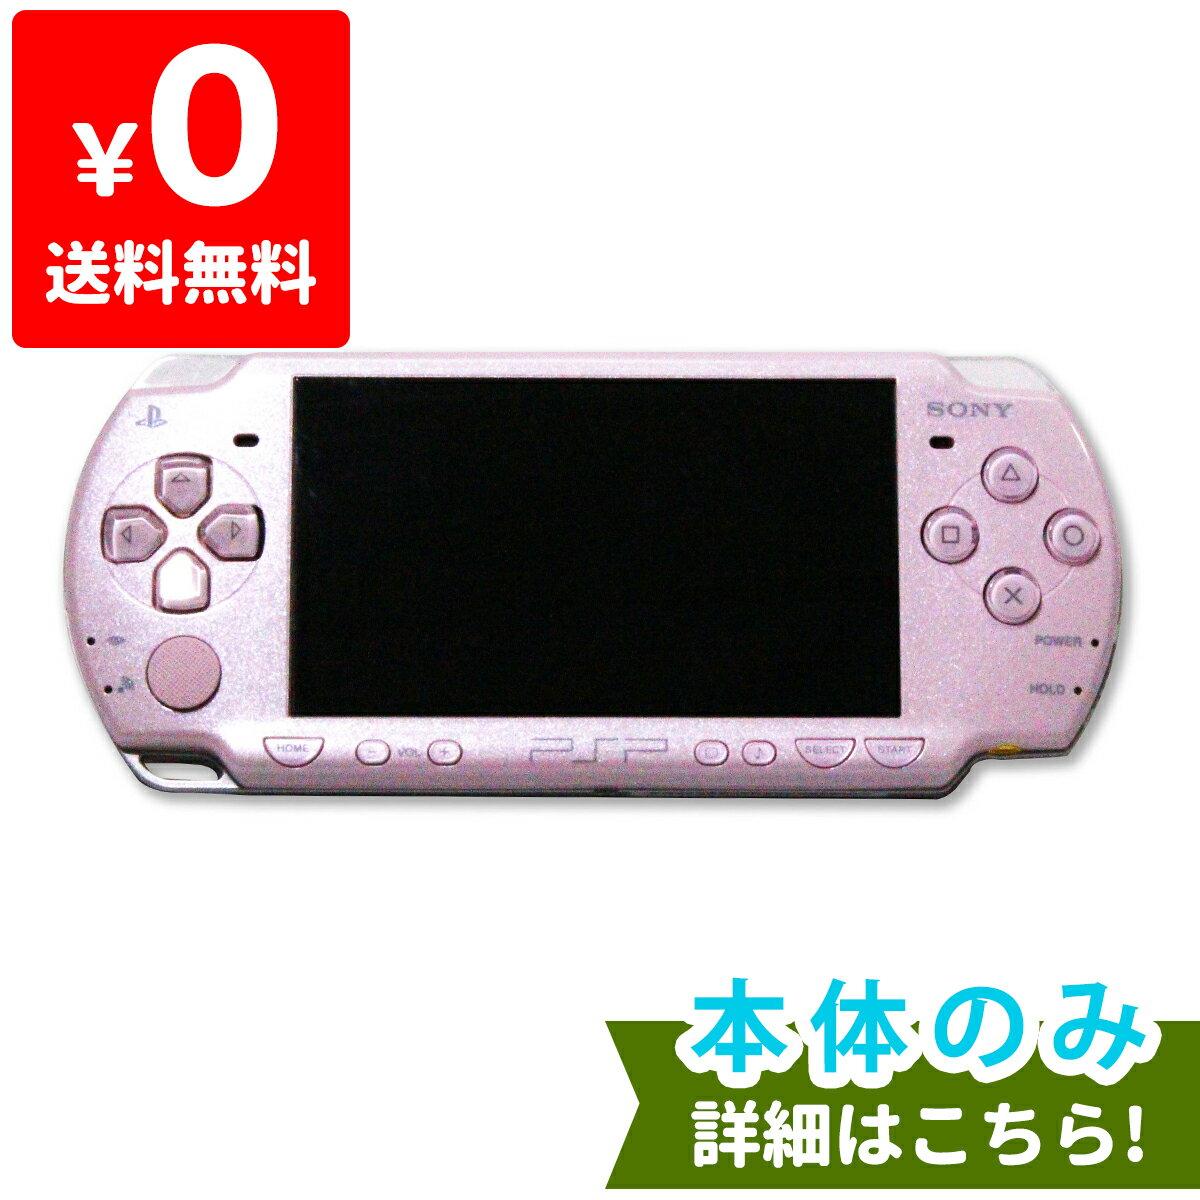 PSP プレイステーション・ポータブル ローズ・ピンク PSP-2000 ピンク PSP2000 本体のみ 本体単品 PlayStationPortable SONY ソニー 中古 4948872411554 送料無料